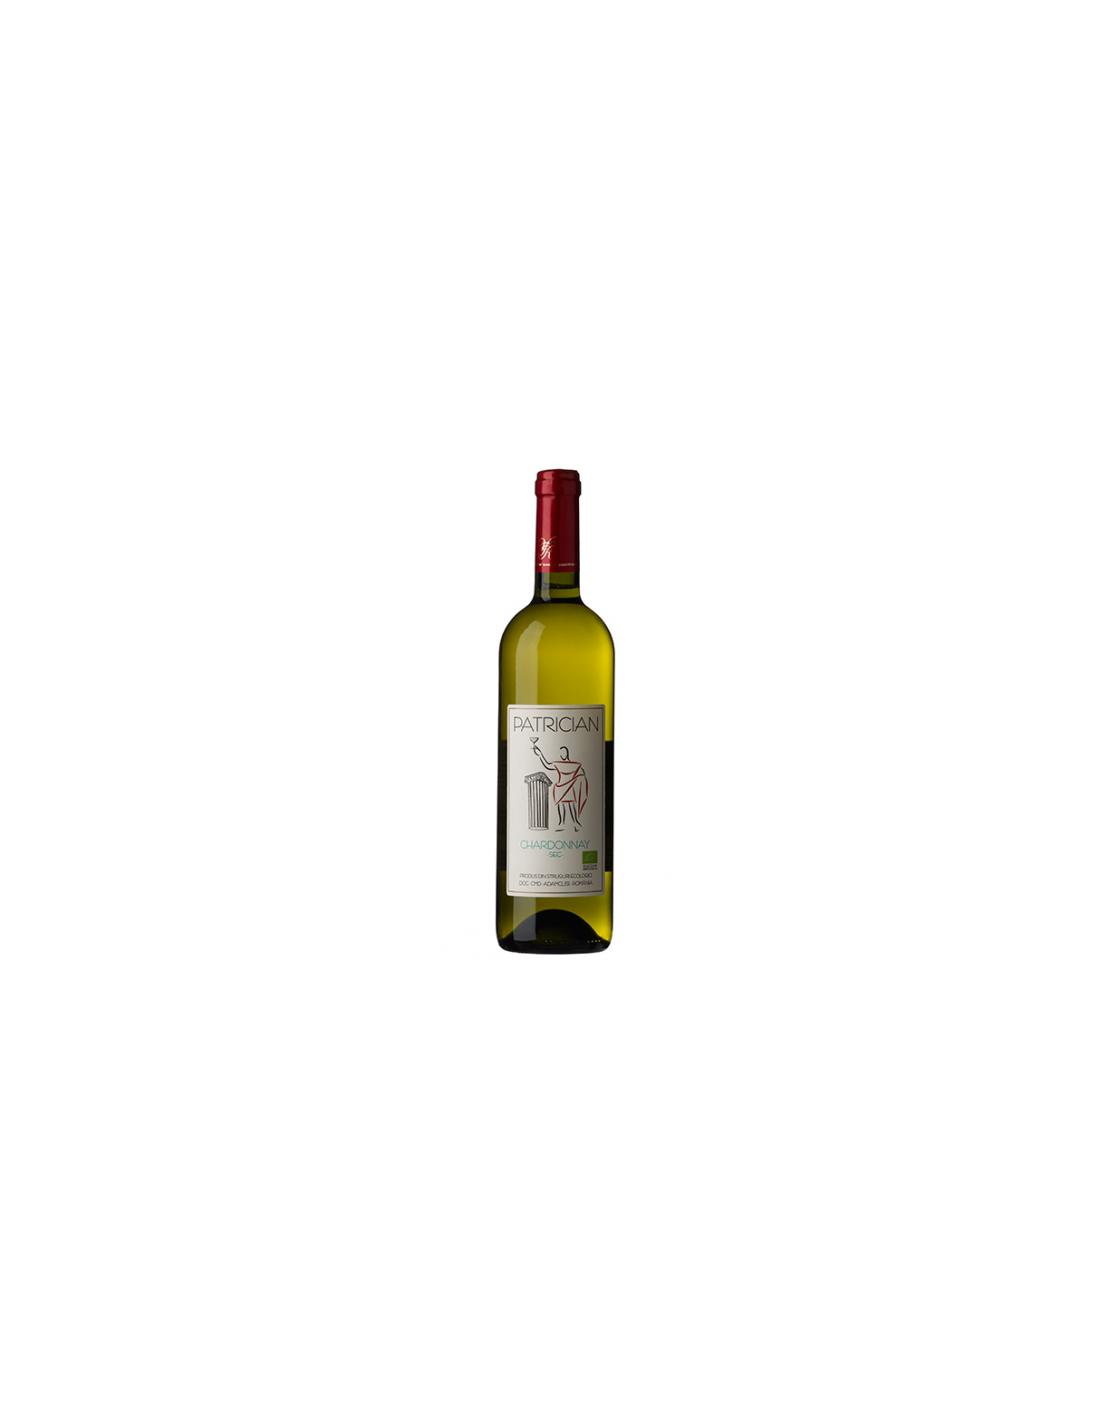 Vin alb sec, Chardonnay, Patrician Dobrudja, 0.75L, 14.5% alc., Romania